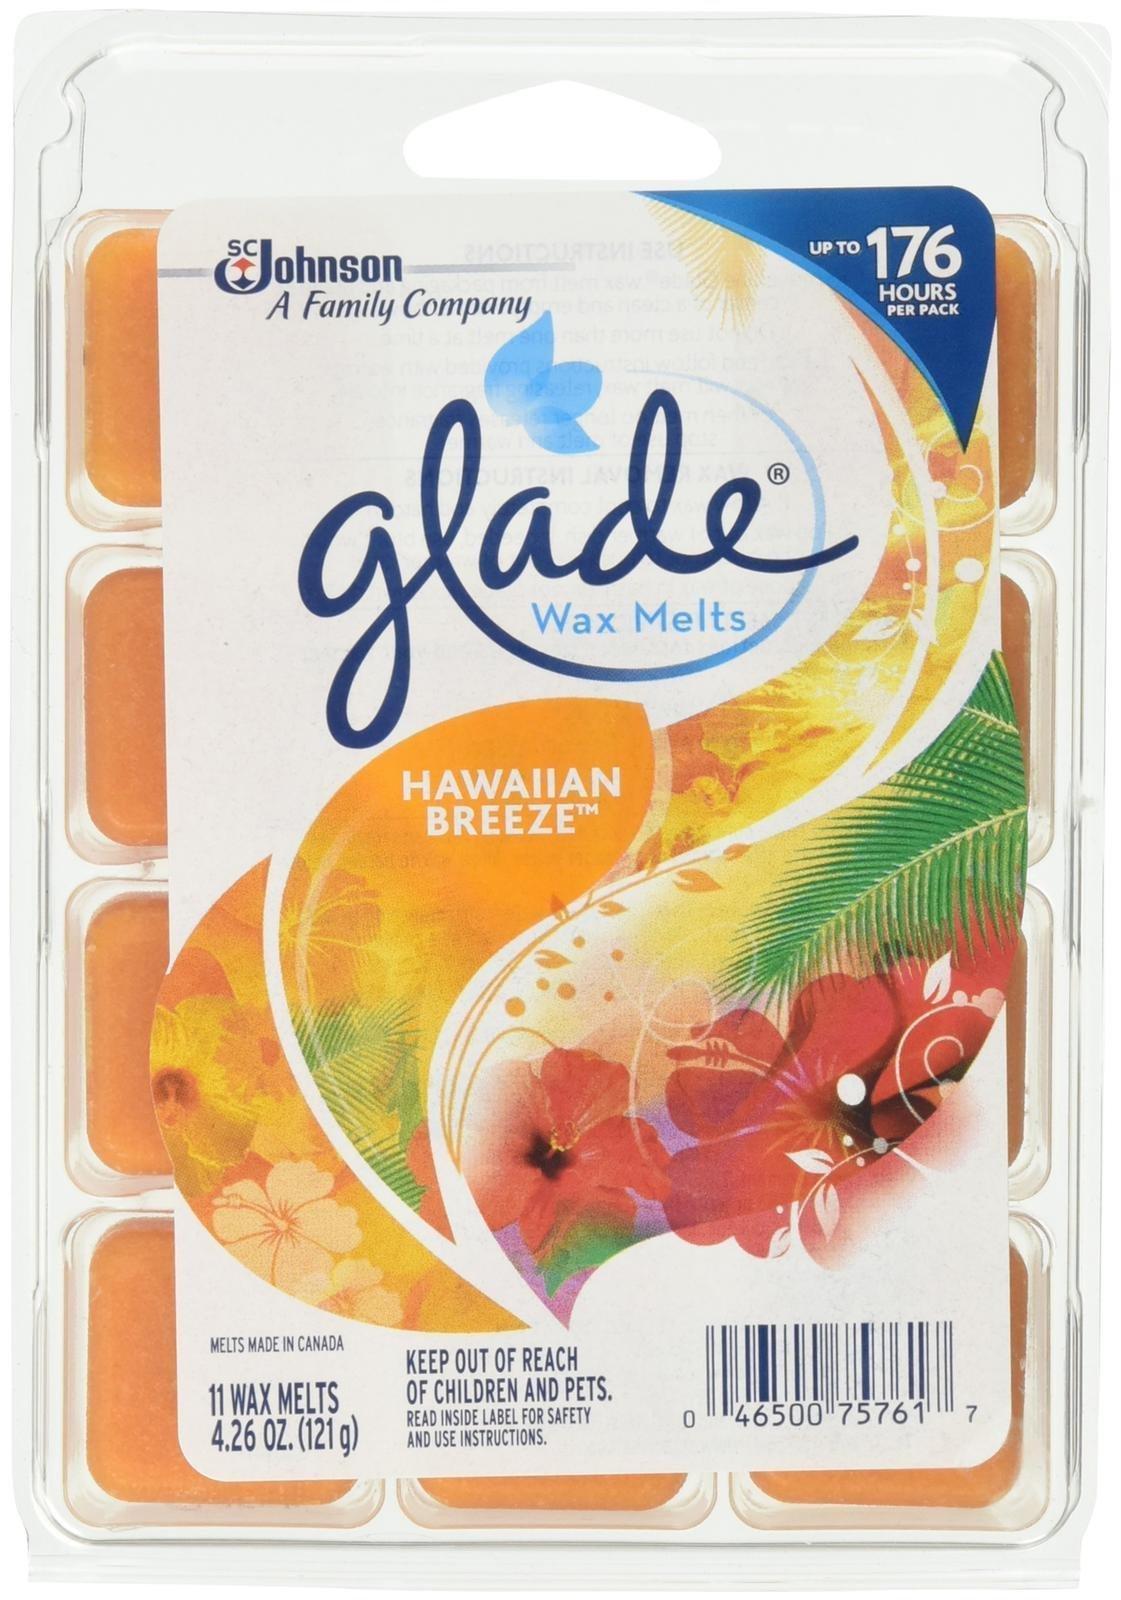 Glade Wax Melts Air Freshener Refill, Hawaiian Breeze, 11 Count, 4.26 Ounce